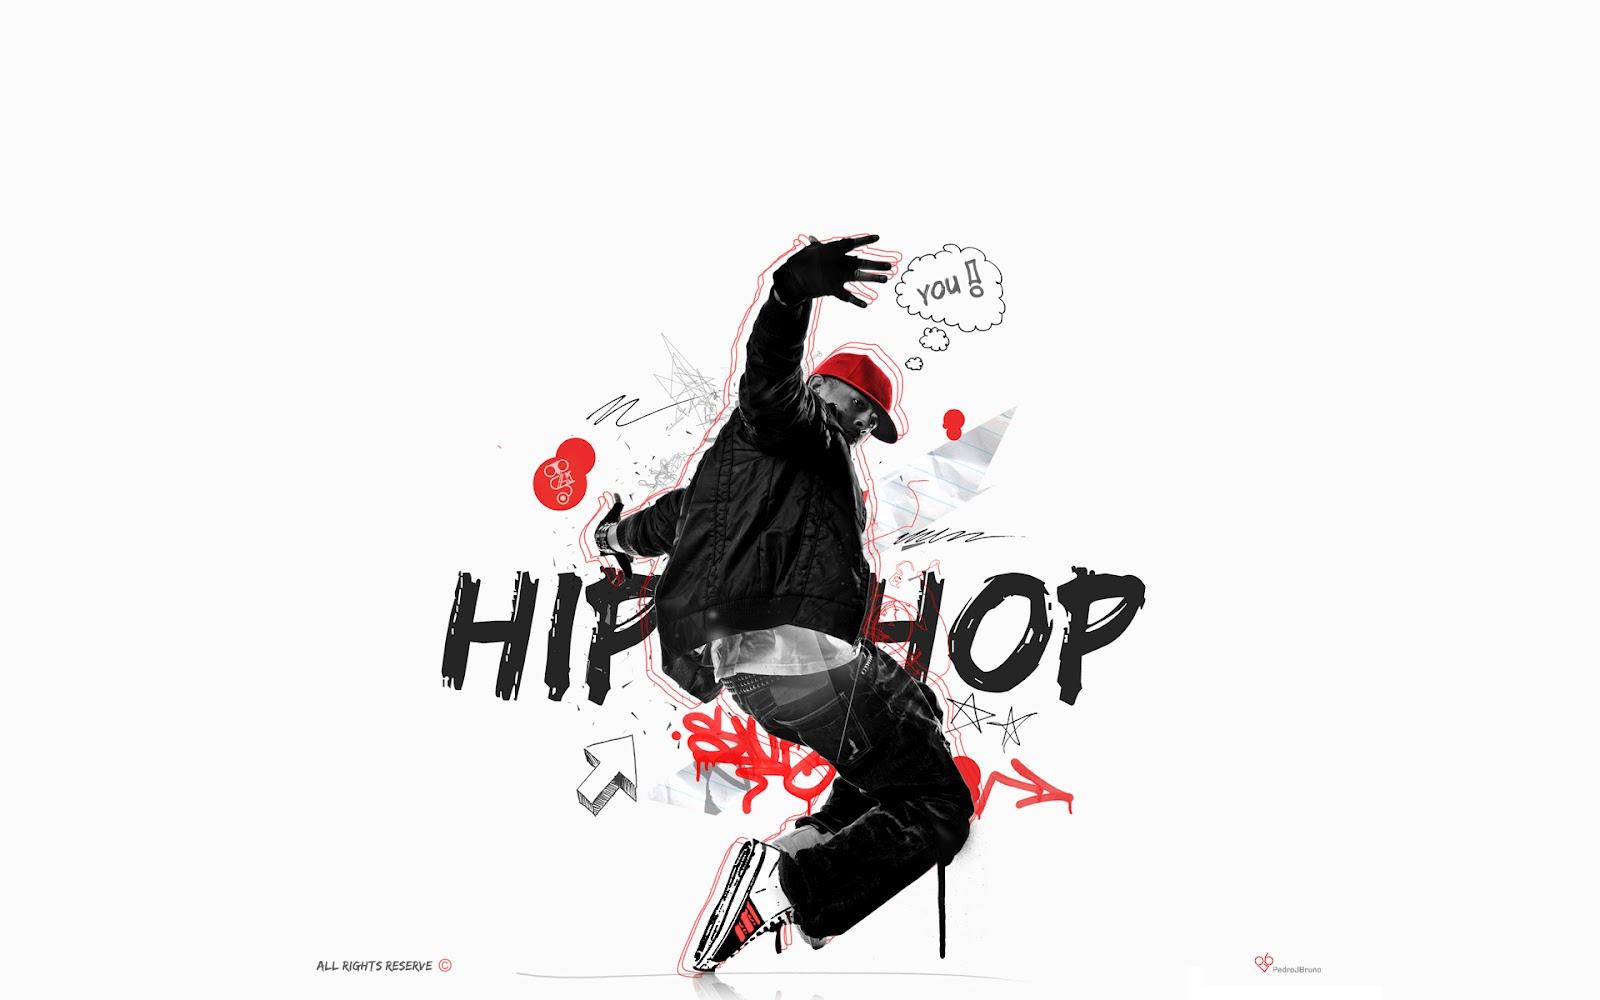 old hindi songs hip hop mix mp3 hindi songs hip hop mix dj mp3. Black Bedroom Furniture Sets. Home Design Ideas